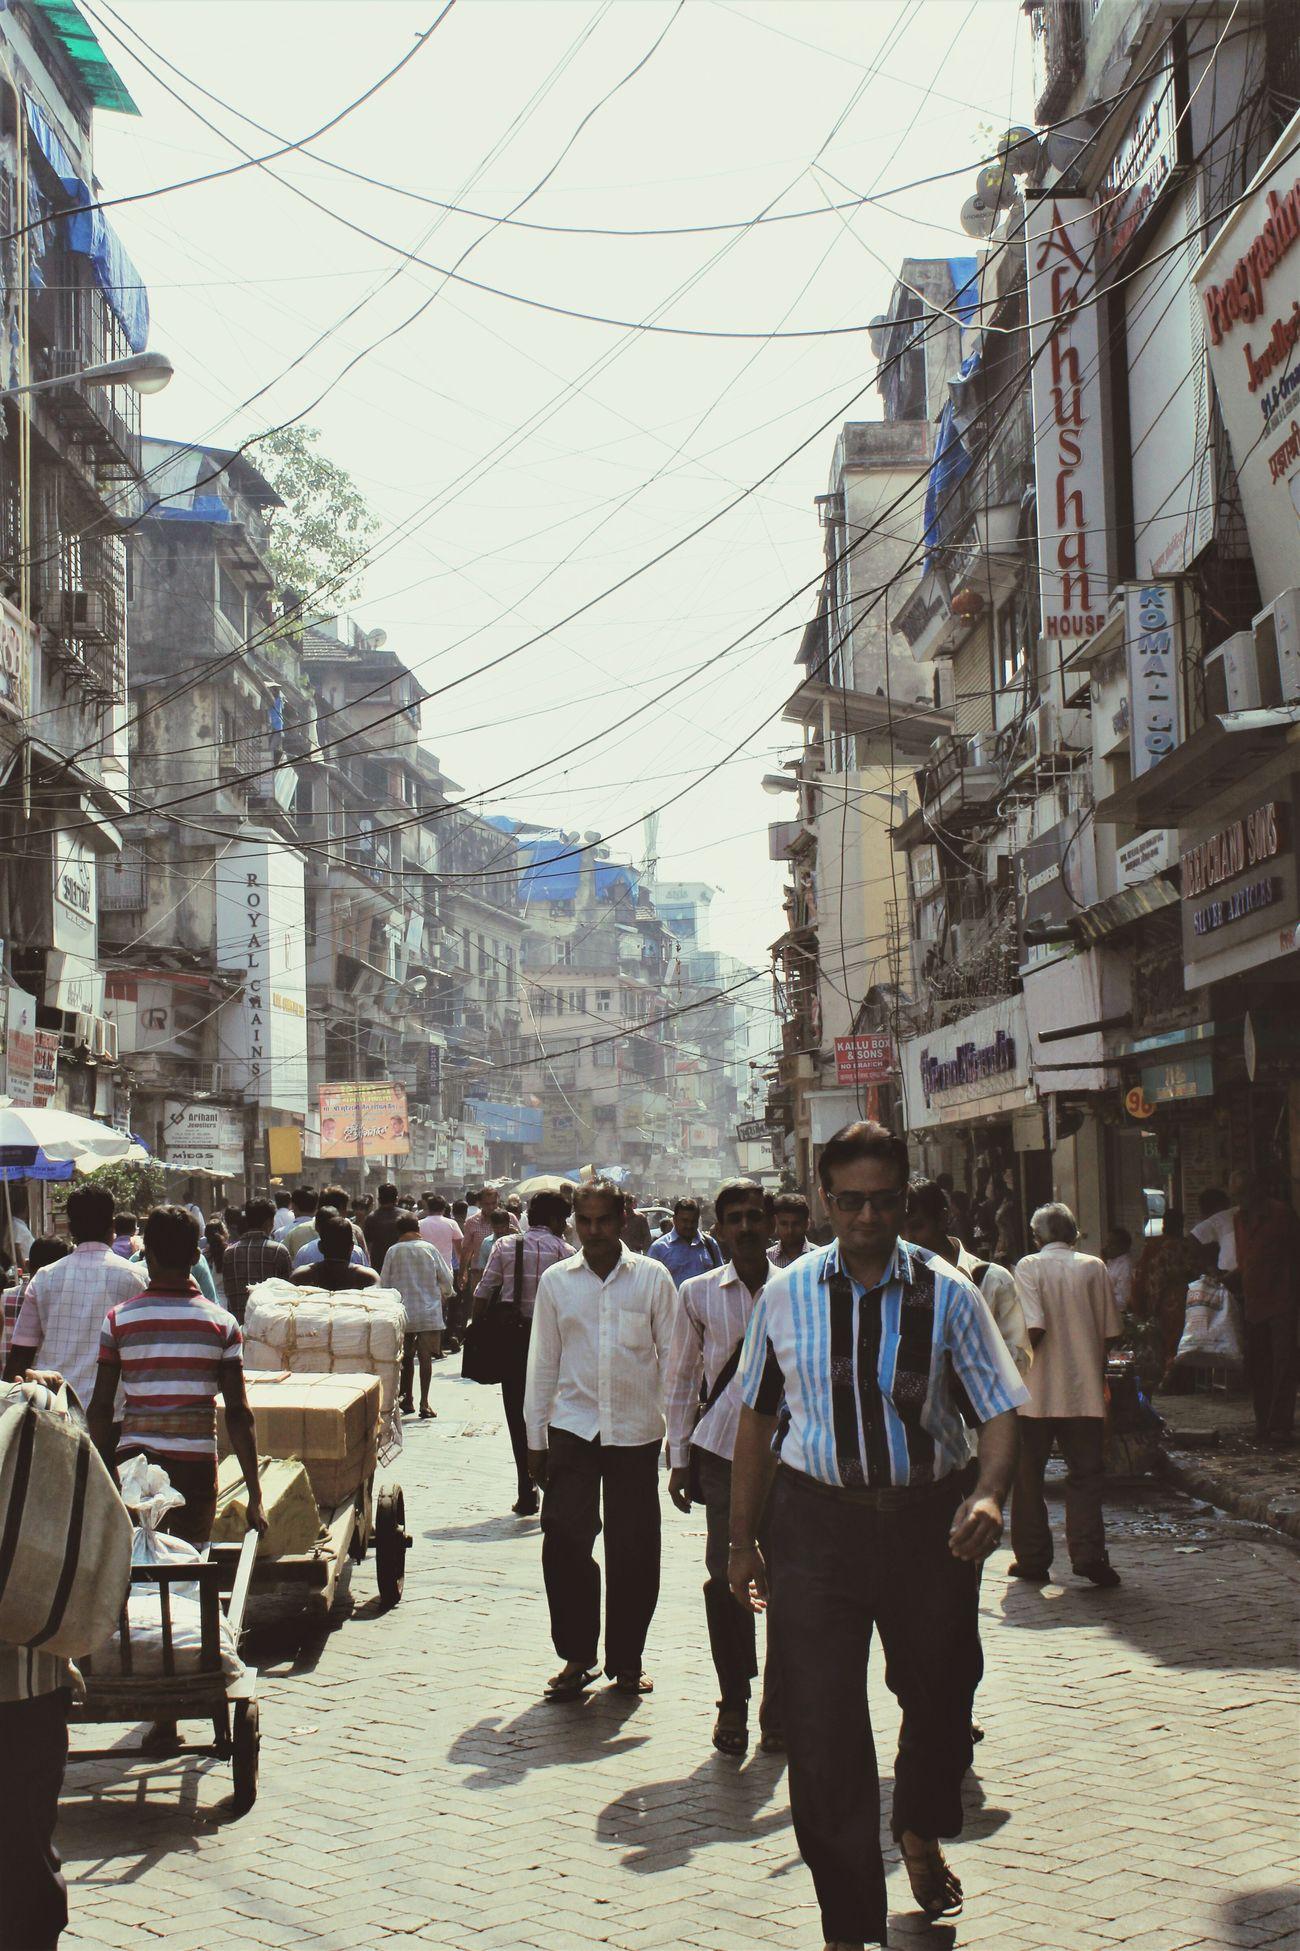 The Street Photographer - 20I7 EyeEm Awards People On The Street People Busy People Busystreet Indian The Street Photographer - 2017 EyeEm Awards